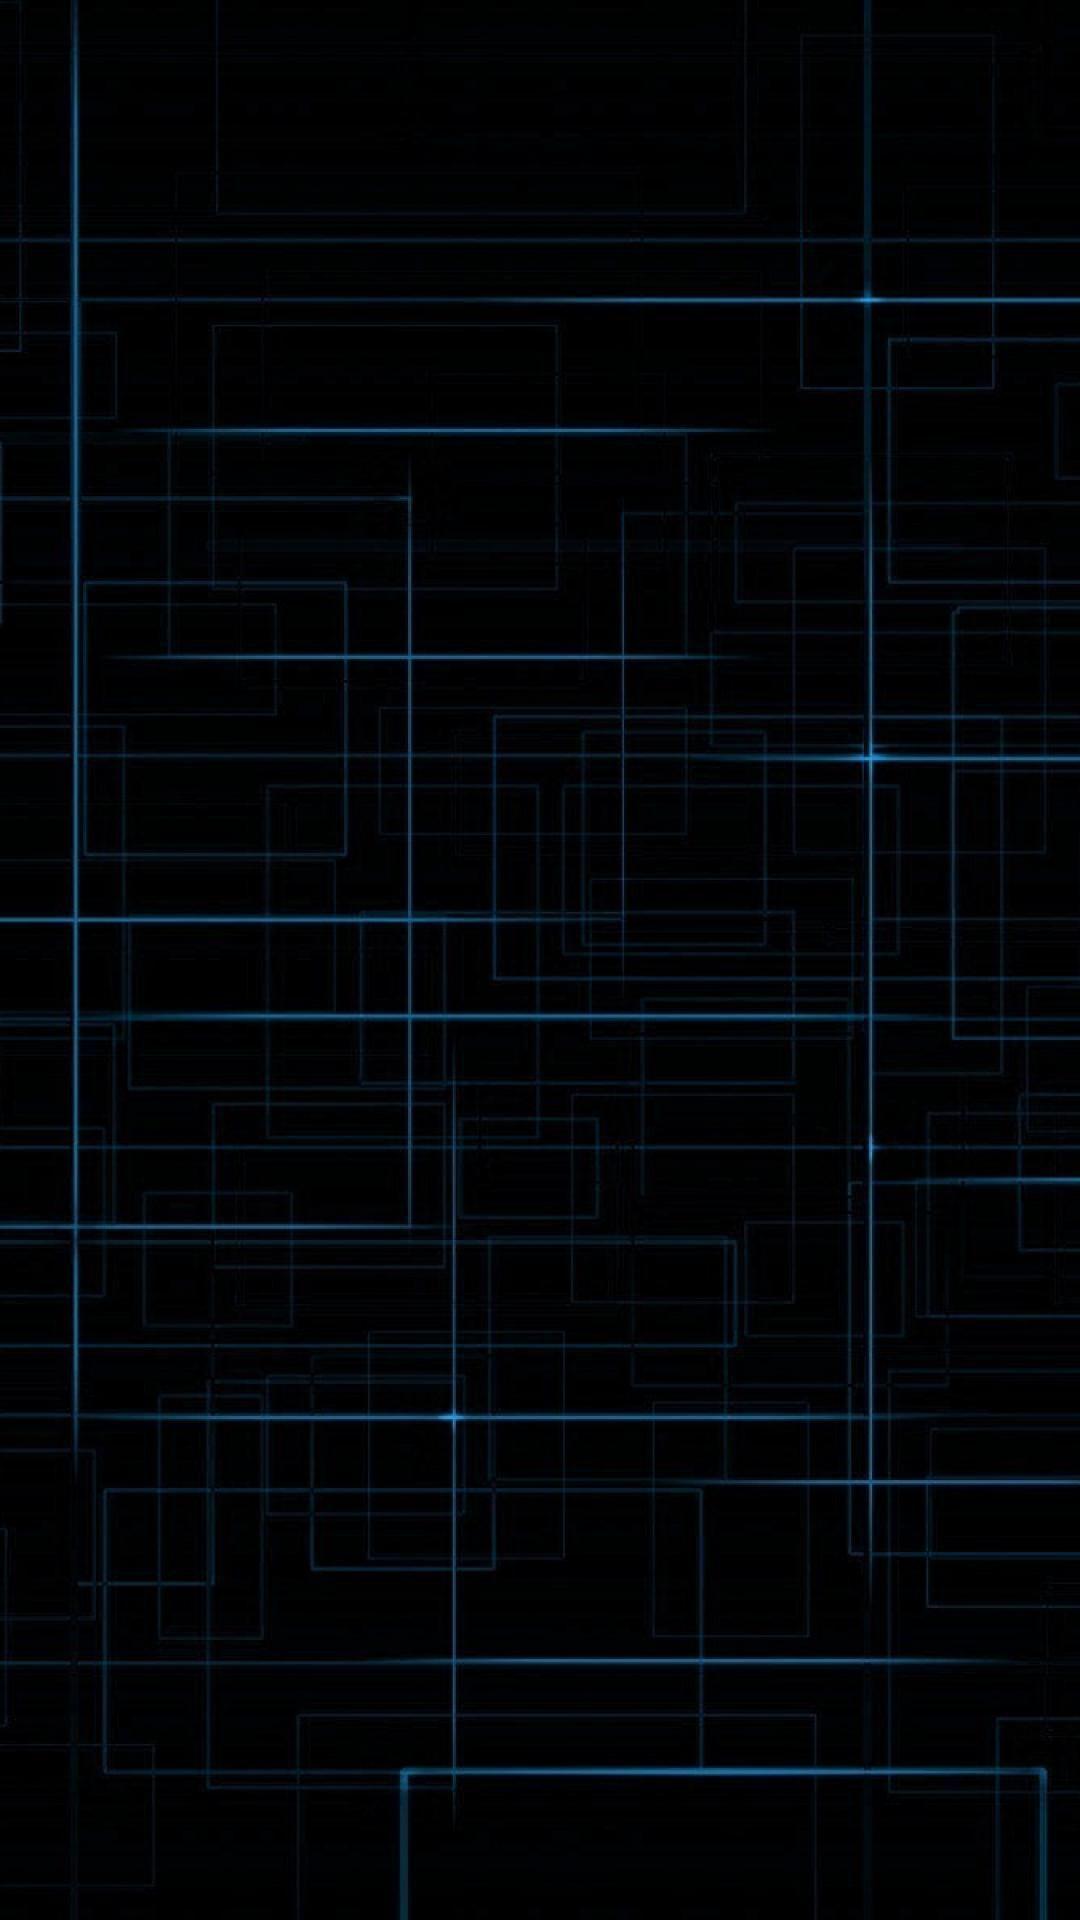 Dark Phone Wallpaper Hd Pixelstalk Net Wallpaper In 2019 Dark Dark Phone Wallpapers Black Wallpaper Phone Wallpaper